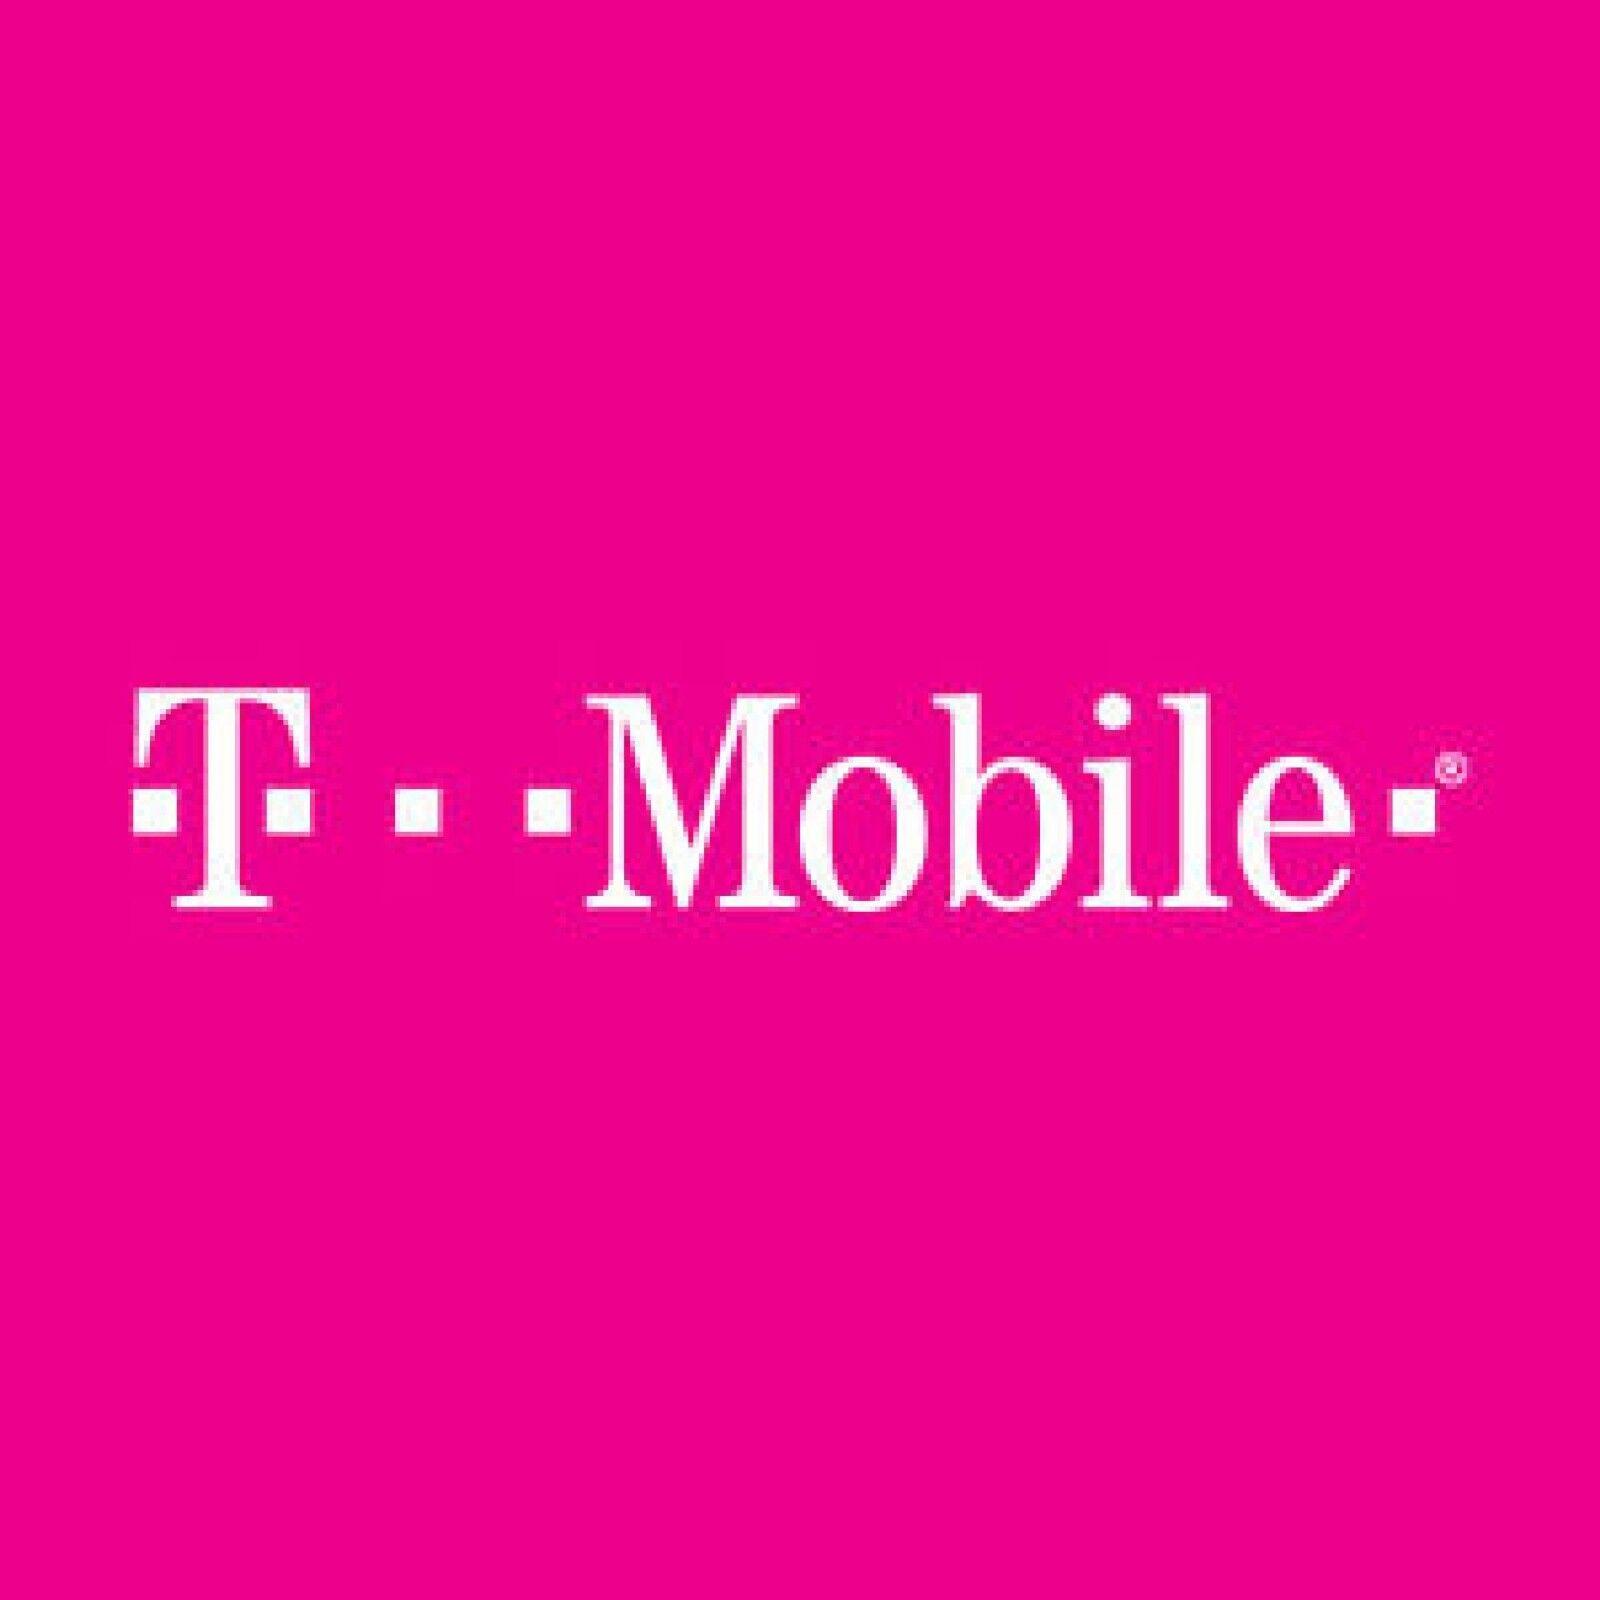 как выглядит Карта для пополнения баланса T-Mobile  Prepaid $10 Refill Top-Up Prepaid Card , AIR TIME  PIN / RECHARGE фото